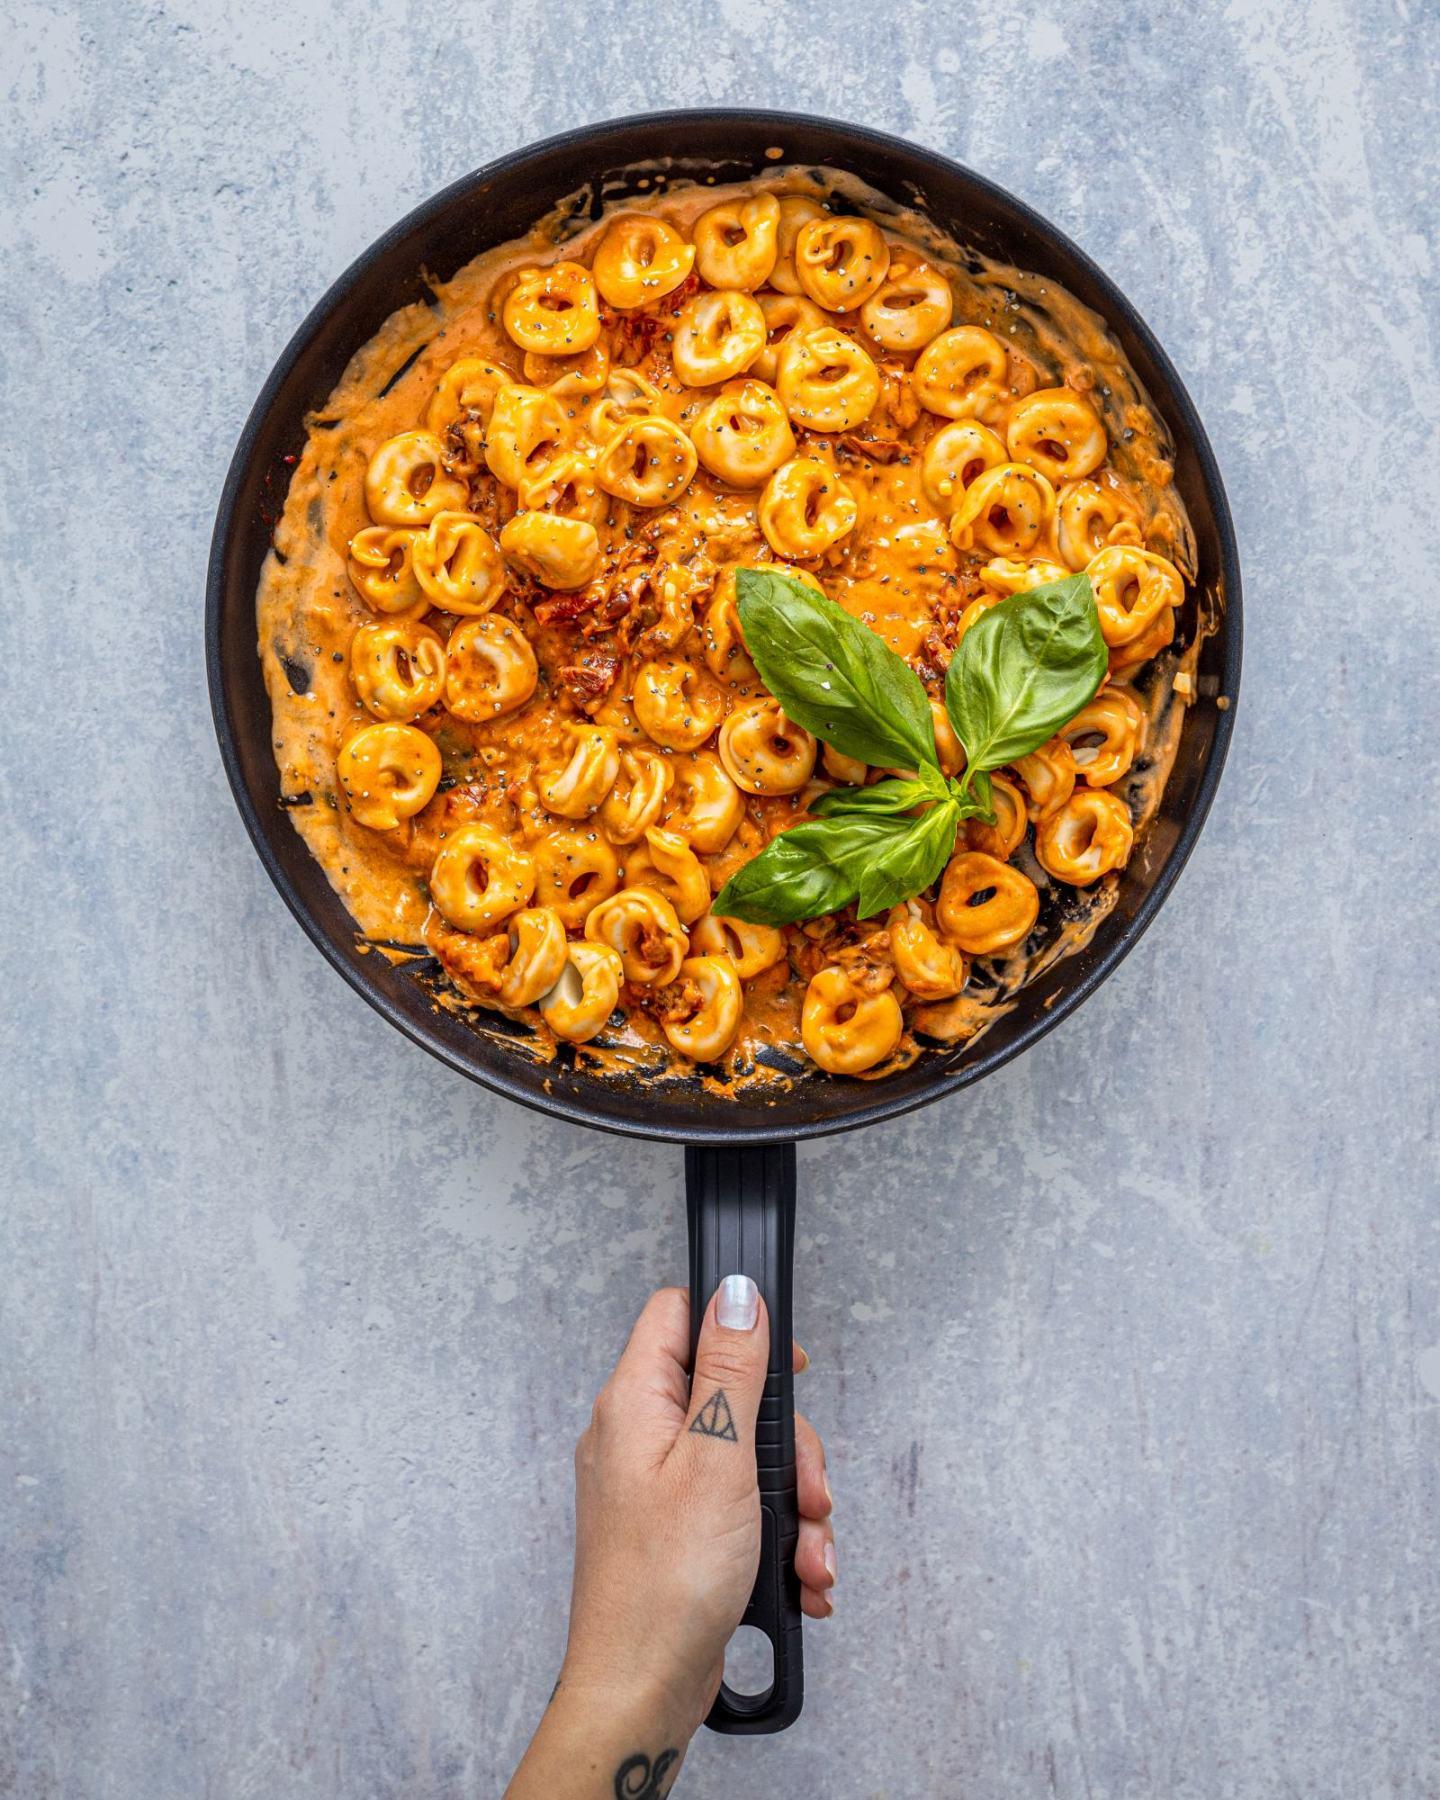 Creamy Sun-Dried Tomato Pasta - Vegan Tortellini